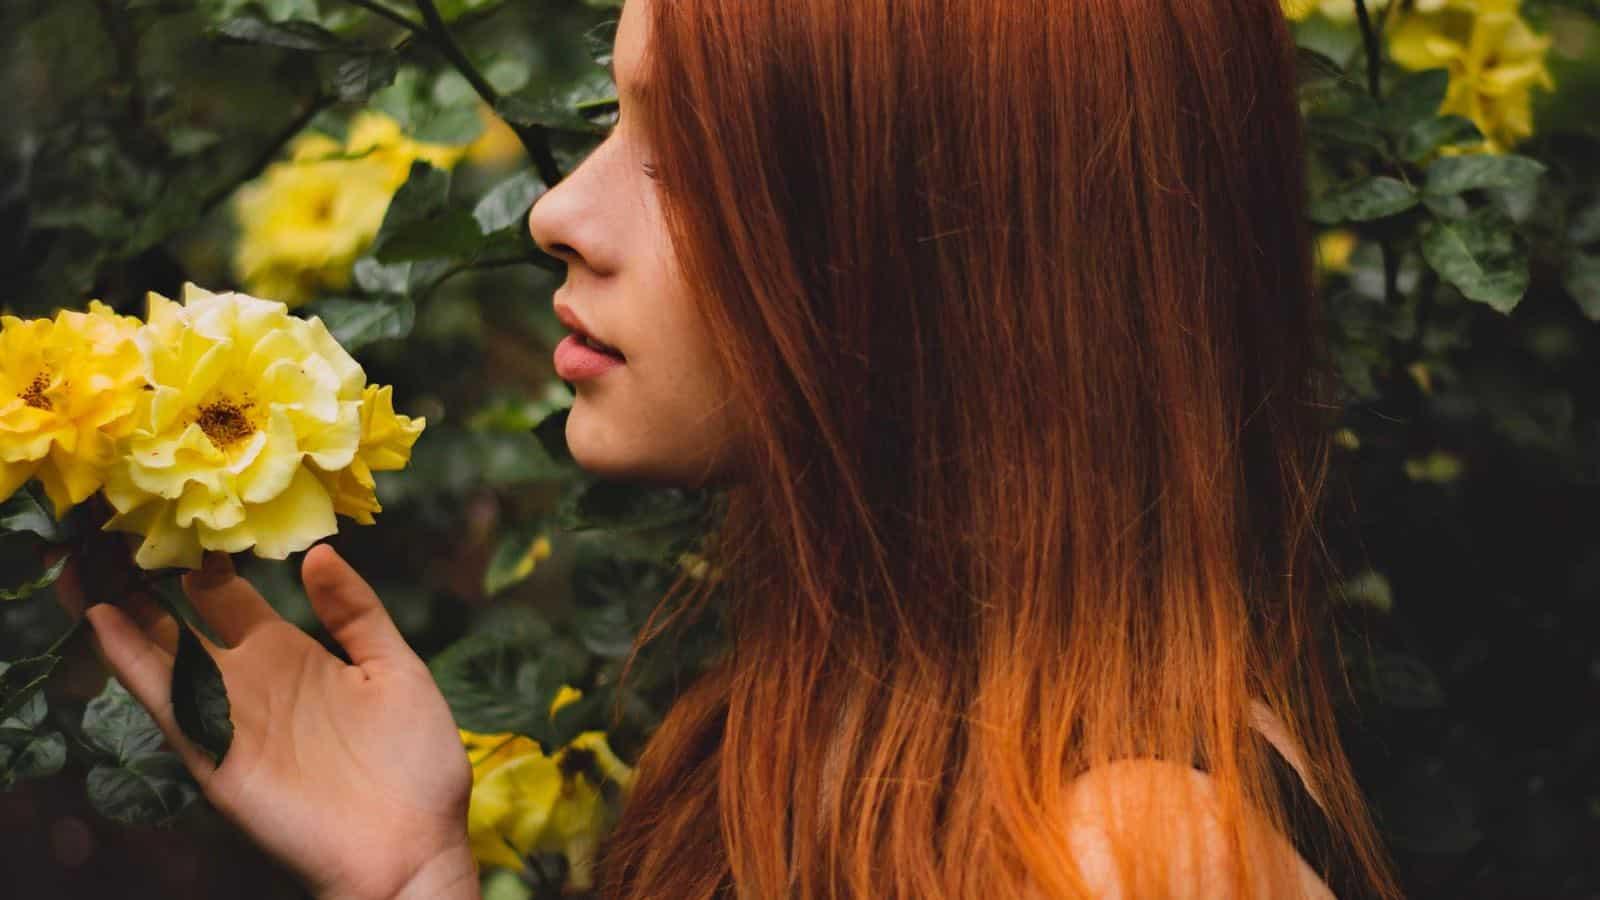 Welche Medikamente können Haarausfall verursachen?